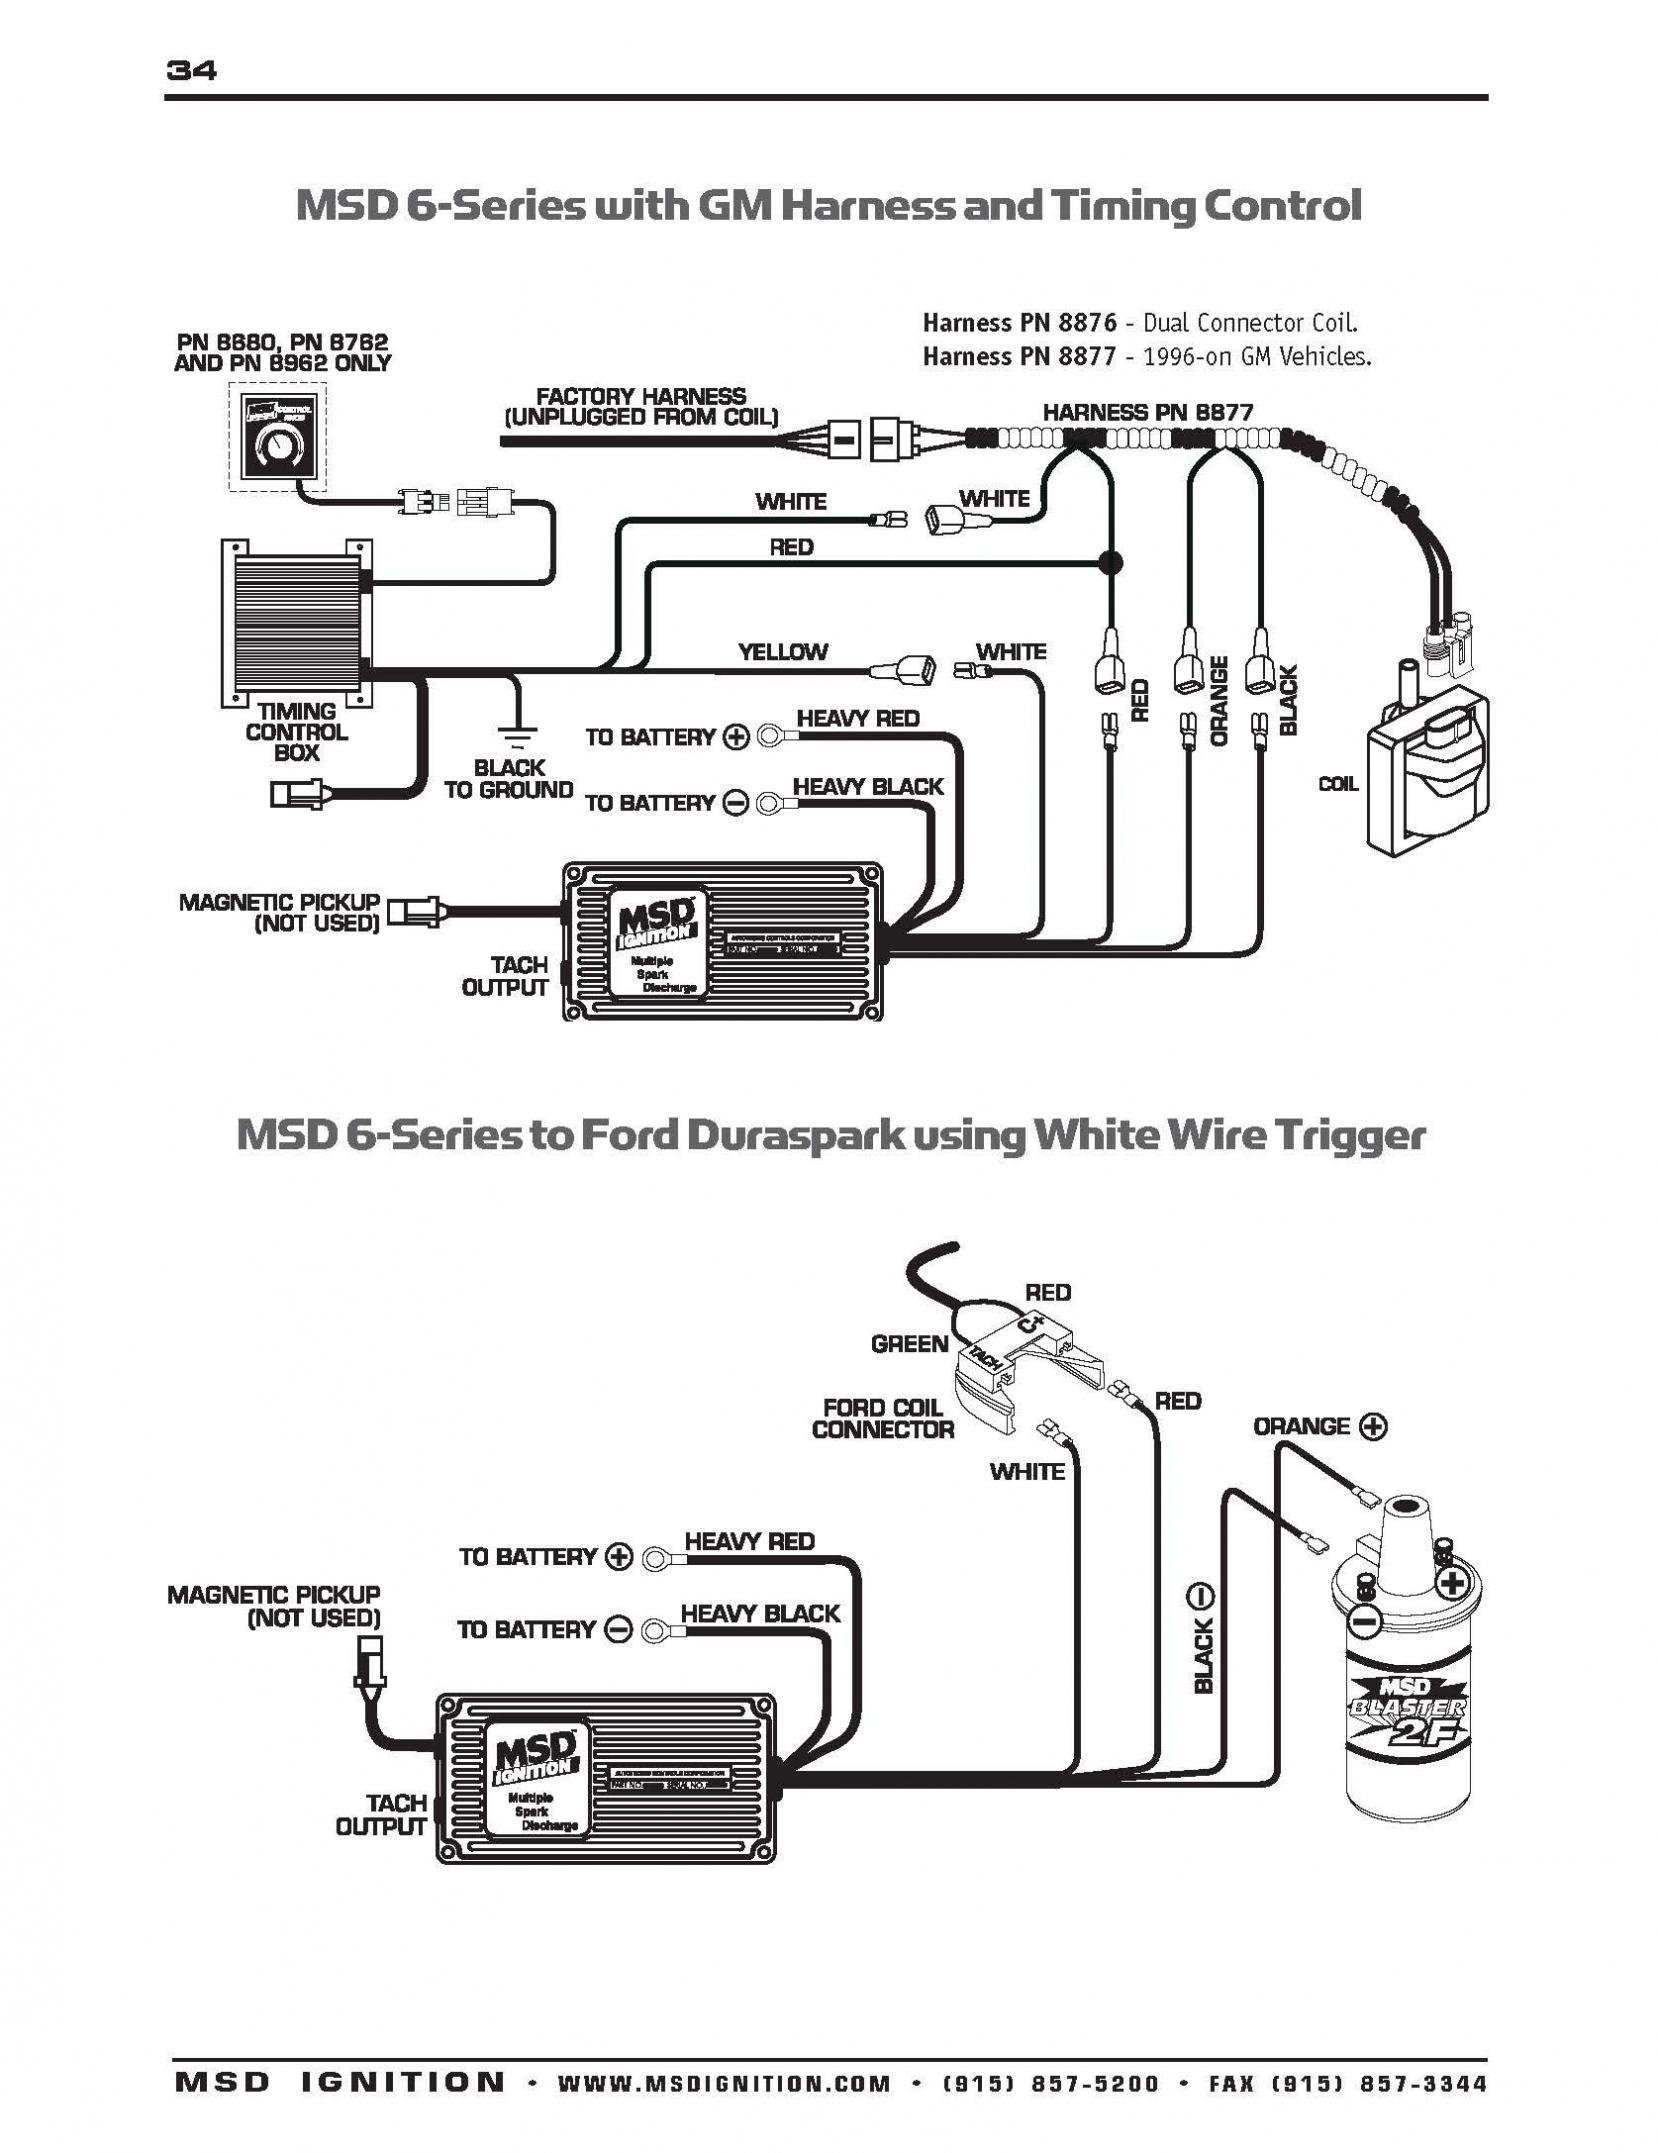 Msd 6Al To Hei Wiring Diagram Wiring Diagram – Hei Wiring Diagram - Msd 6Al Wiring Diagram Chevy